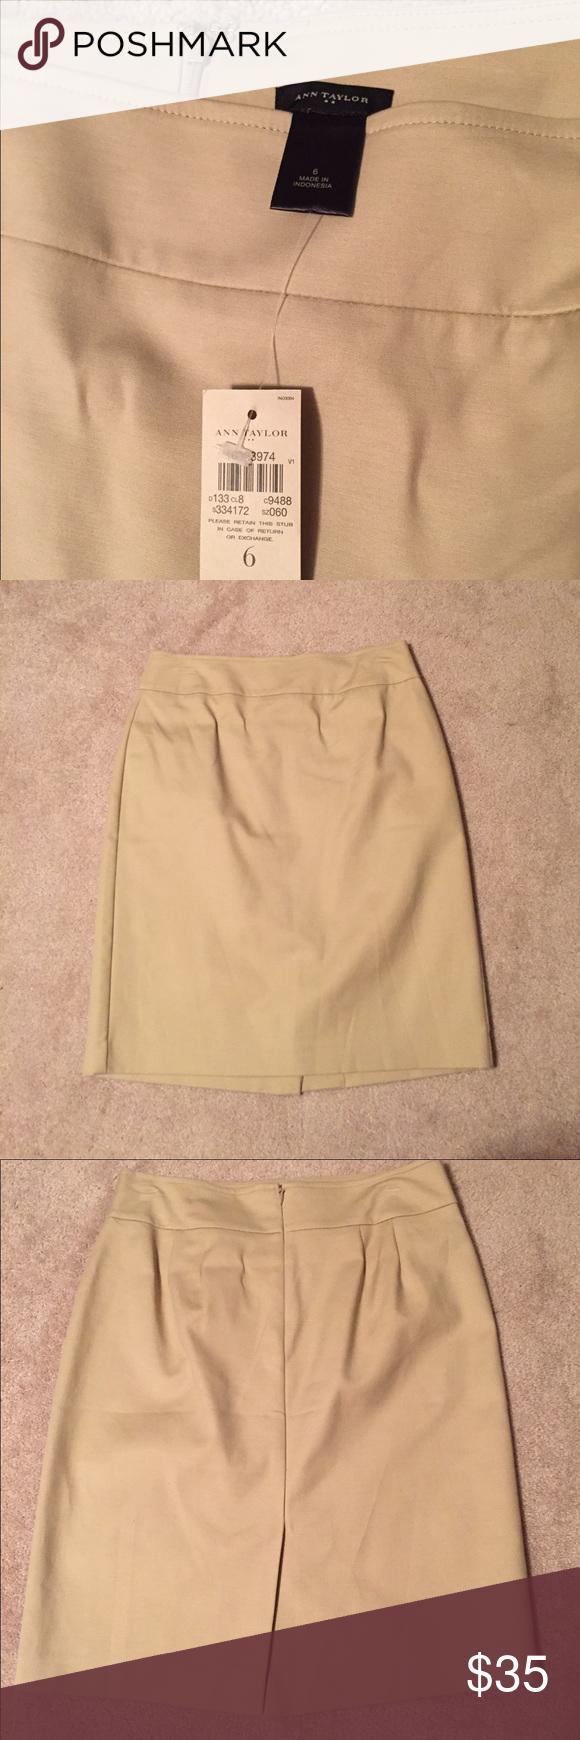 Ann Taylor Skirt NWT Size 6 Ann Taylor Skirt NWT Size 6 Ann Taylor Skirts